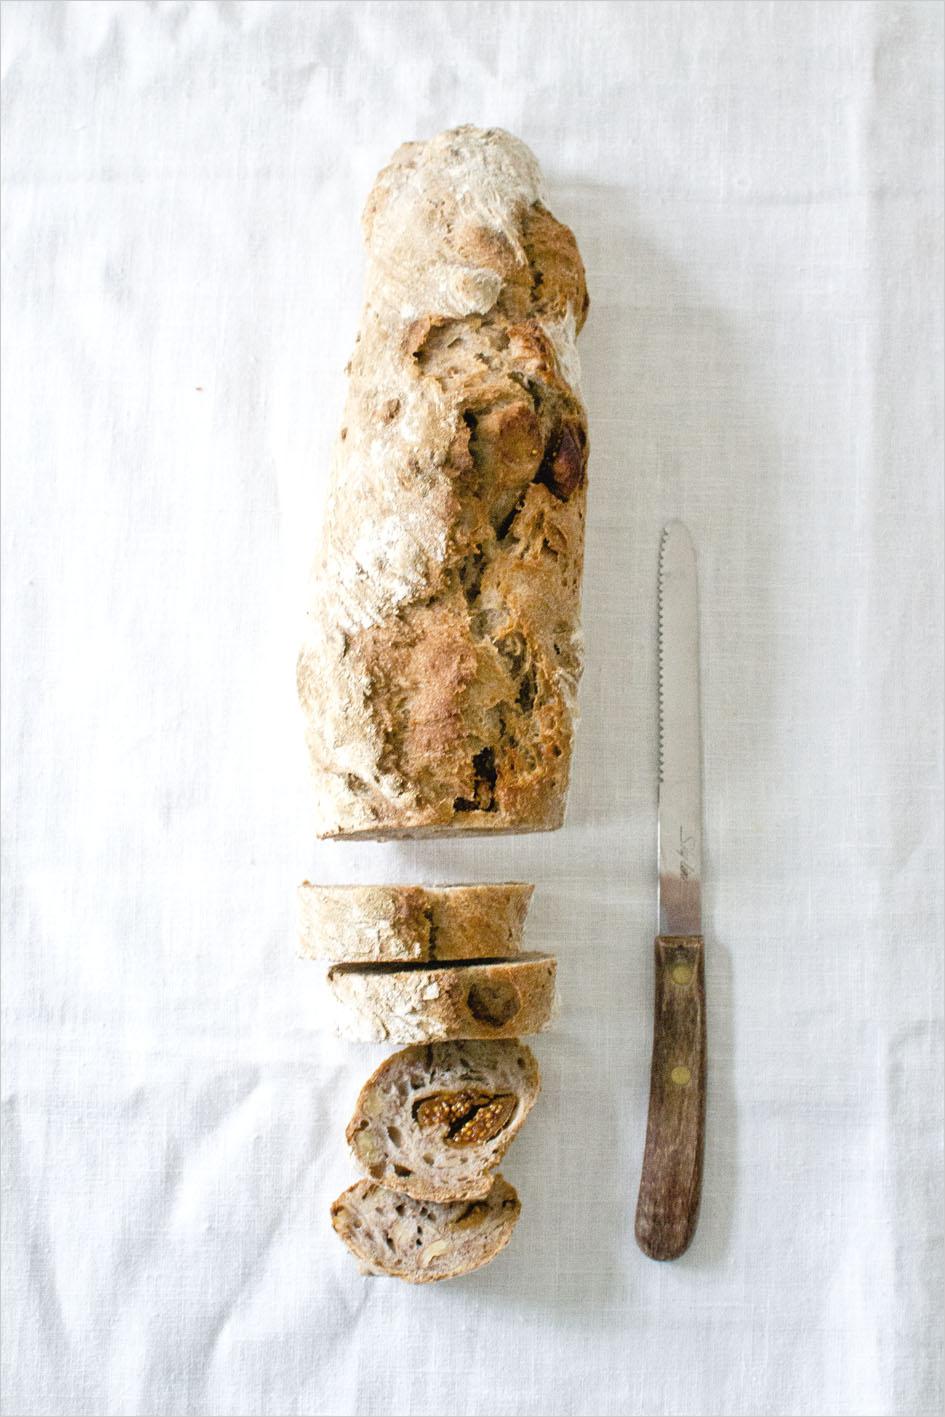 Feigen-Walnuss-Brot | chestnutandsage.de